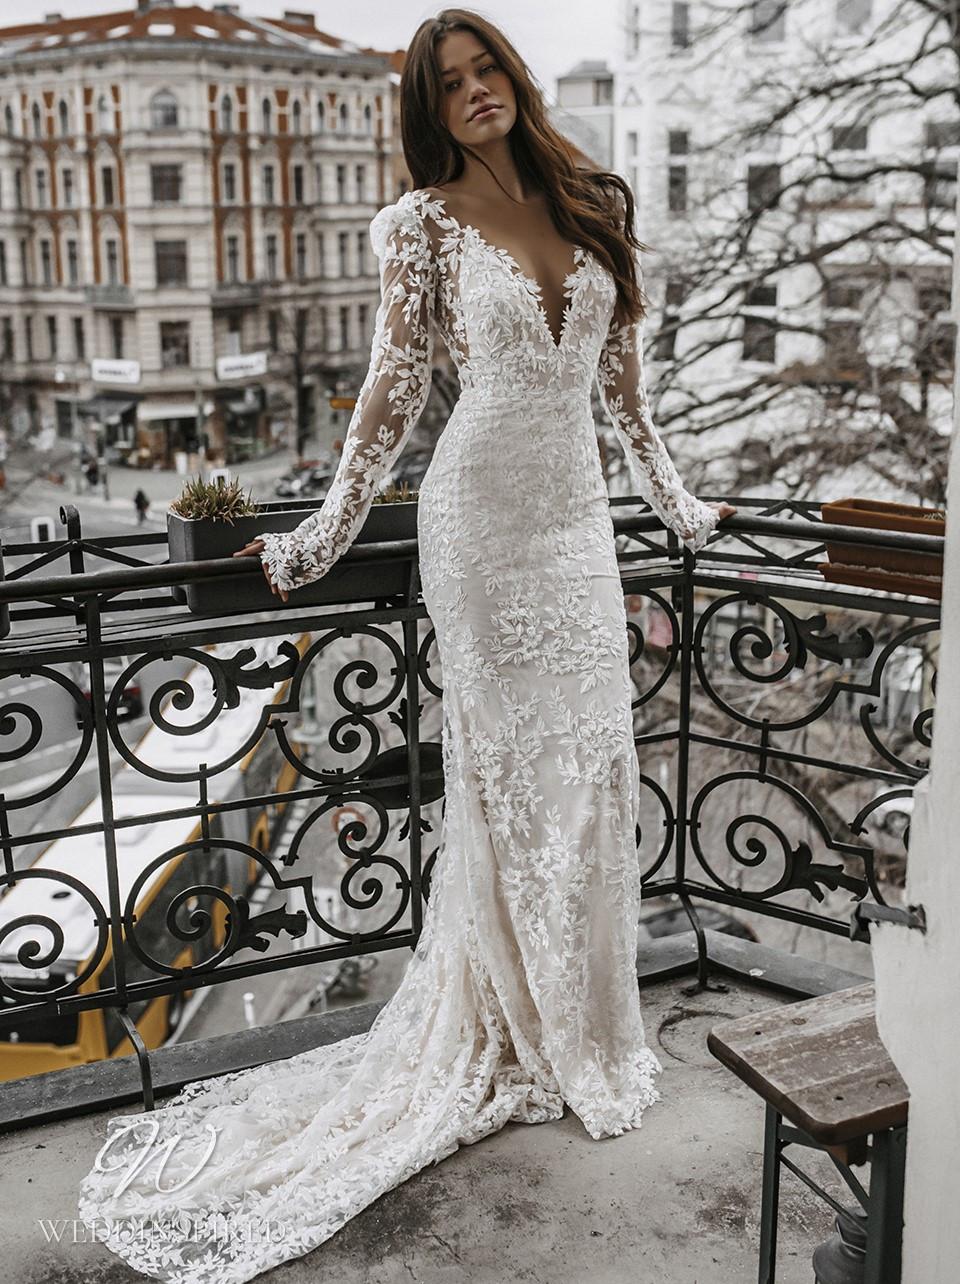 A Galia Lahav 2022 romantic lace mermaid wedding dress with long sleeves